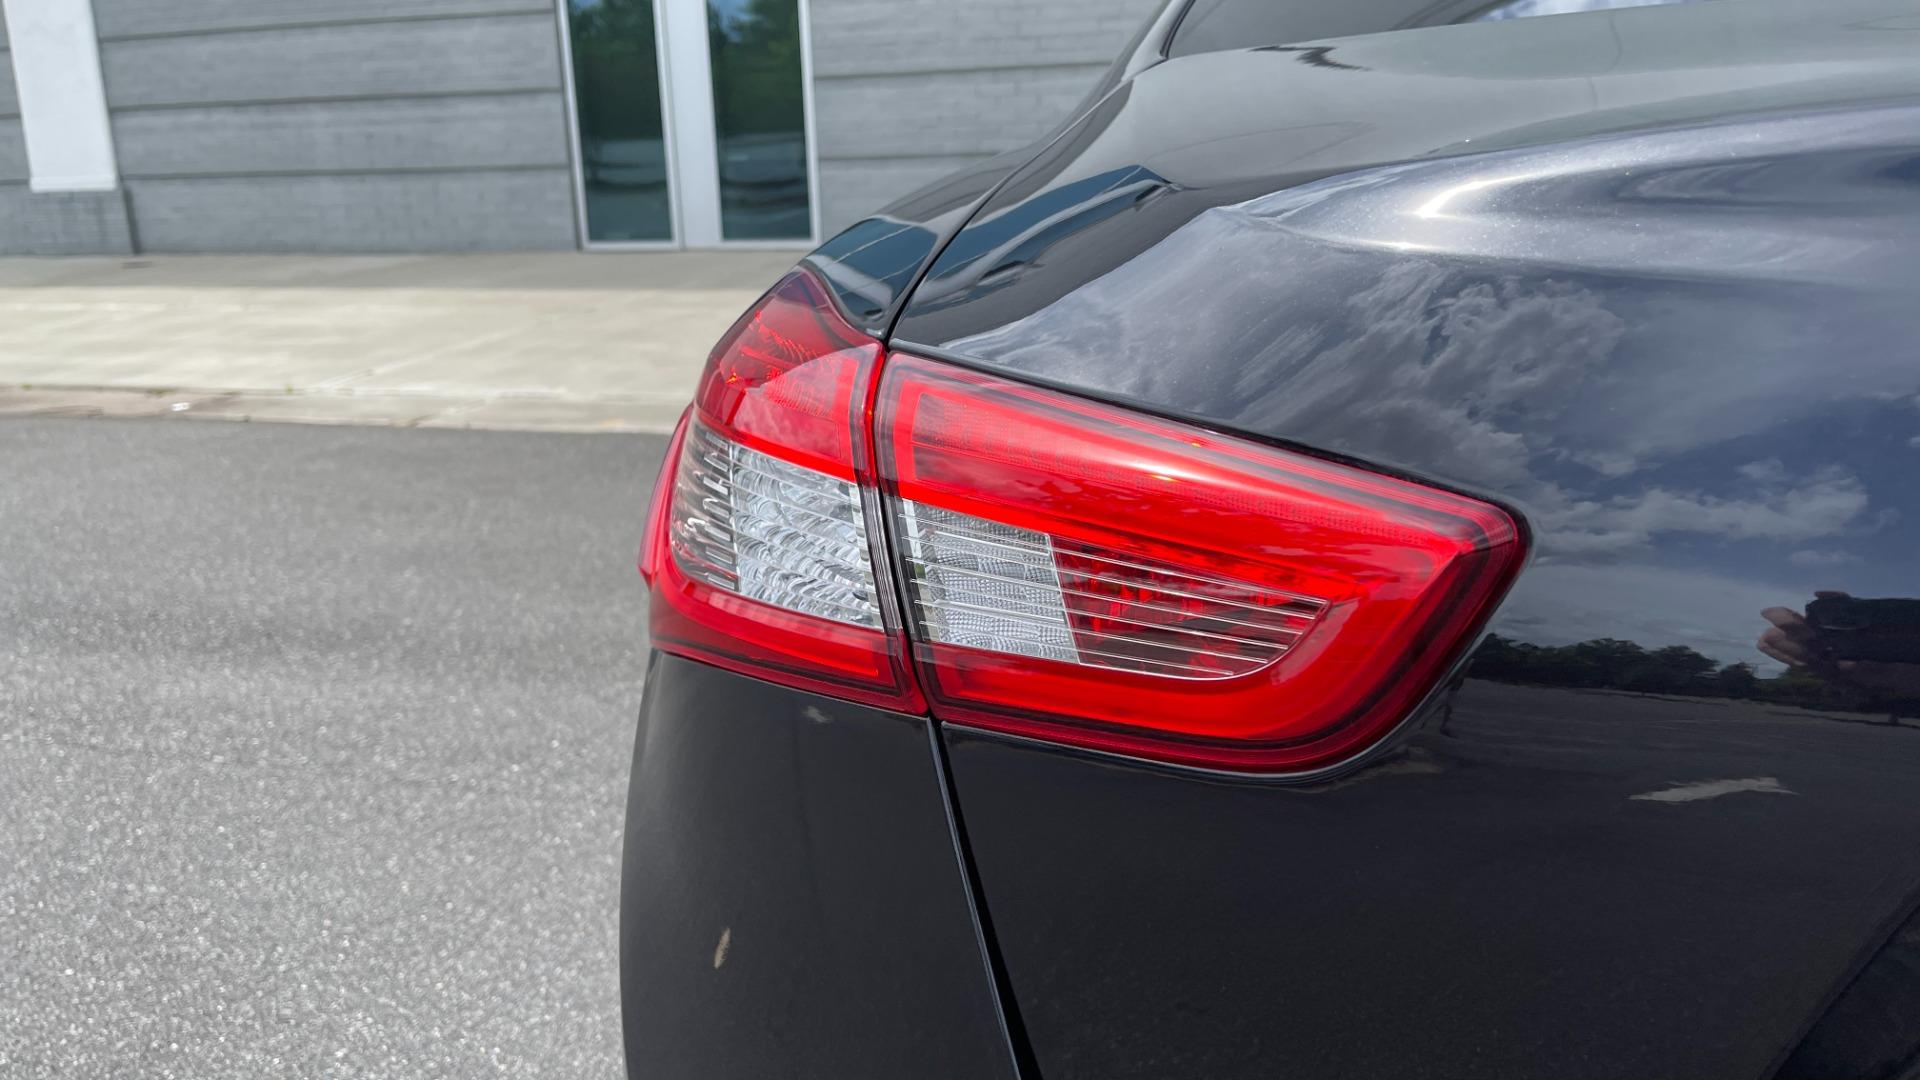 Used 2018 Maserati GHIBLI S Q4 SEDAN / AWD / 3.0L V6 / SUNROOF / NAV / REARVIEW for sale $51,995 at Formula Imports in Charlotte NC 28227 20